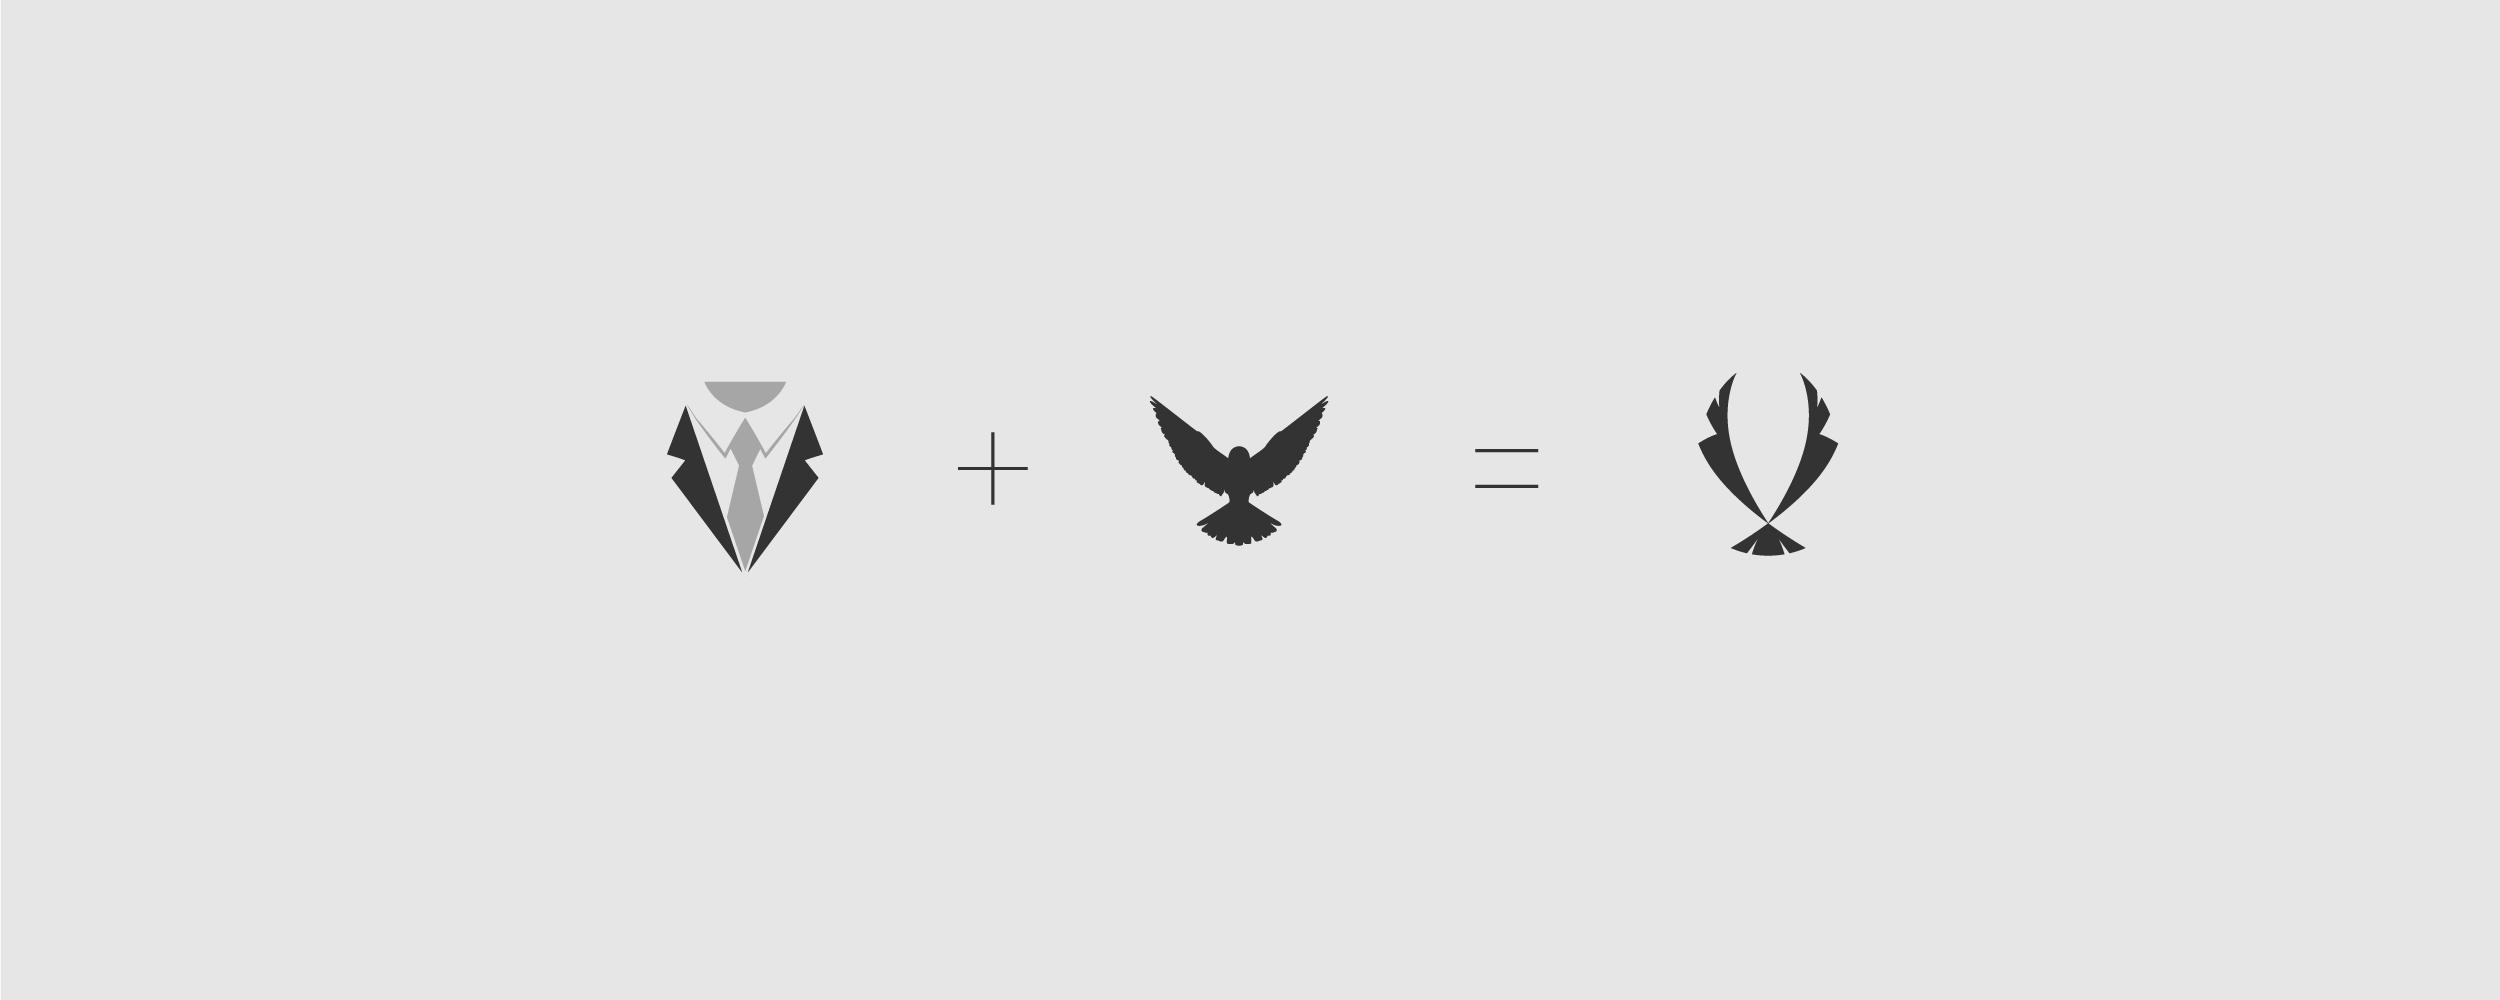 galamb_behance_concept